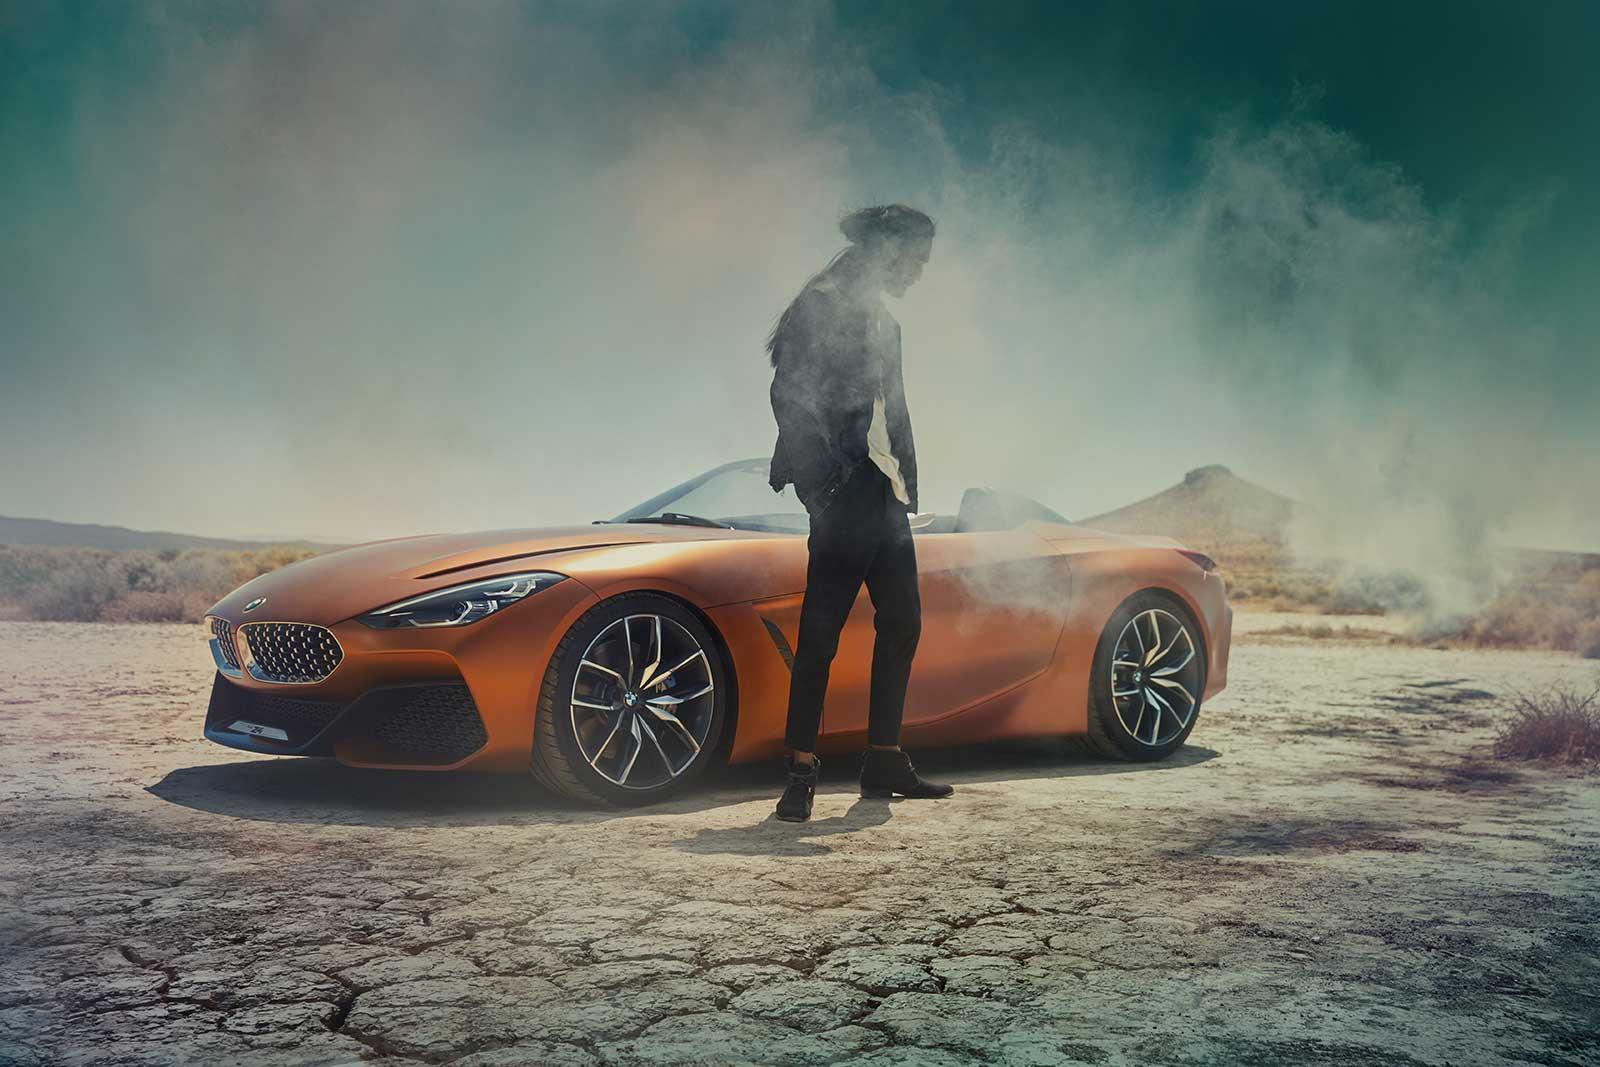 BMW-Z4-Concept-Peeble-Beach-2017-10.jpg